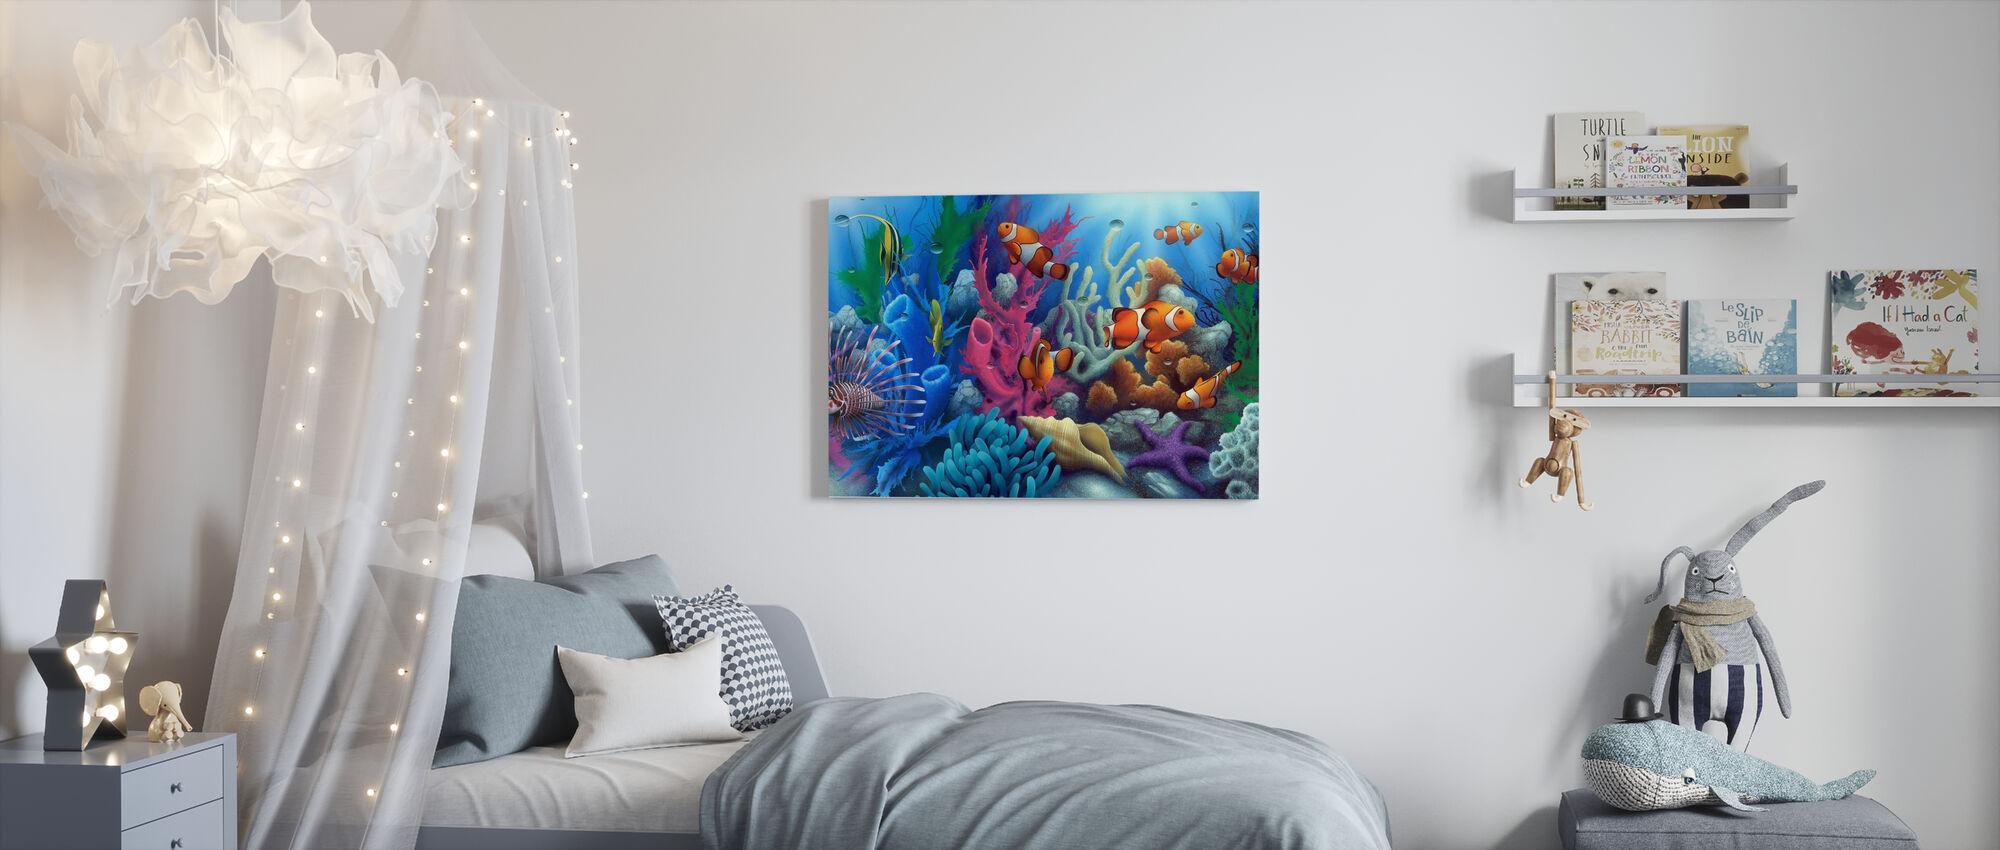 Around The World 2 - Canvas print - Kids Room